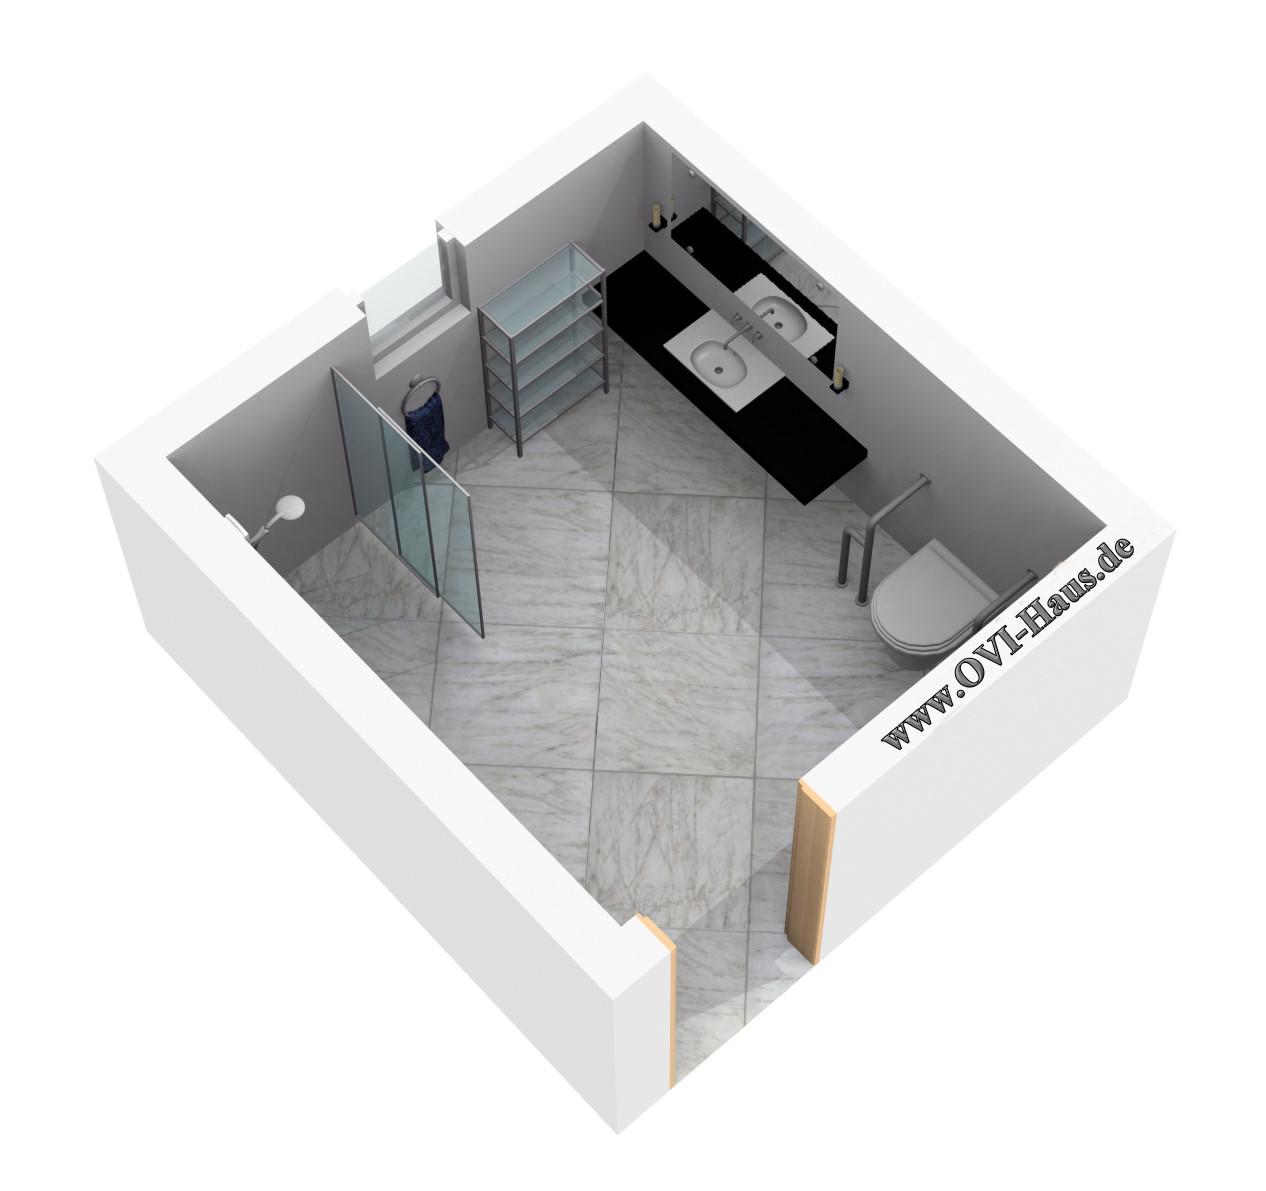 Modulhaus ovi haus modulbau wohn container mobiles wohnen for Bat box obi